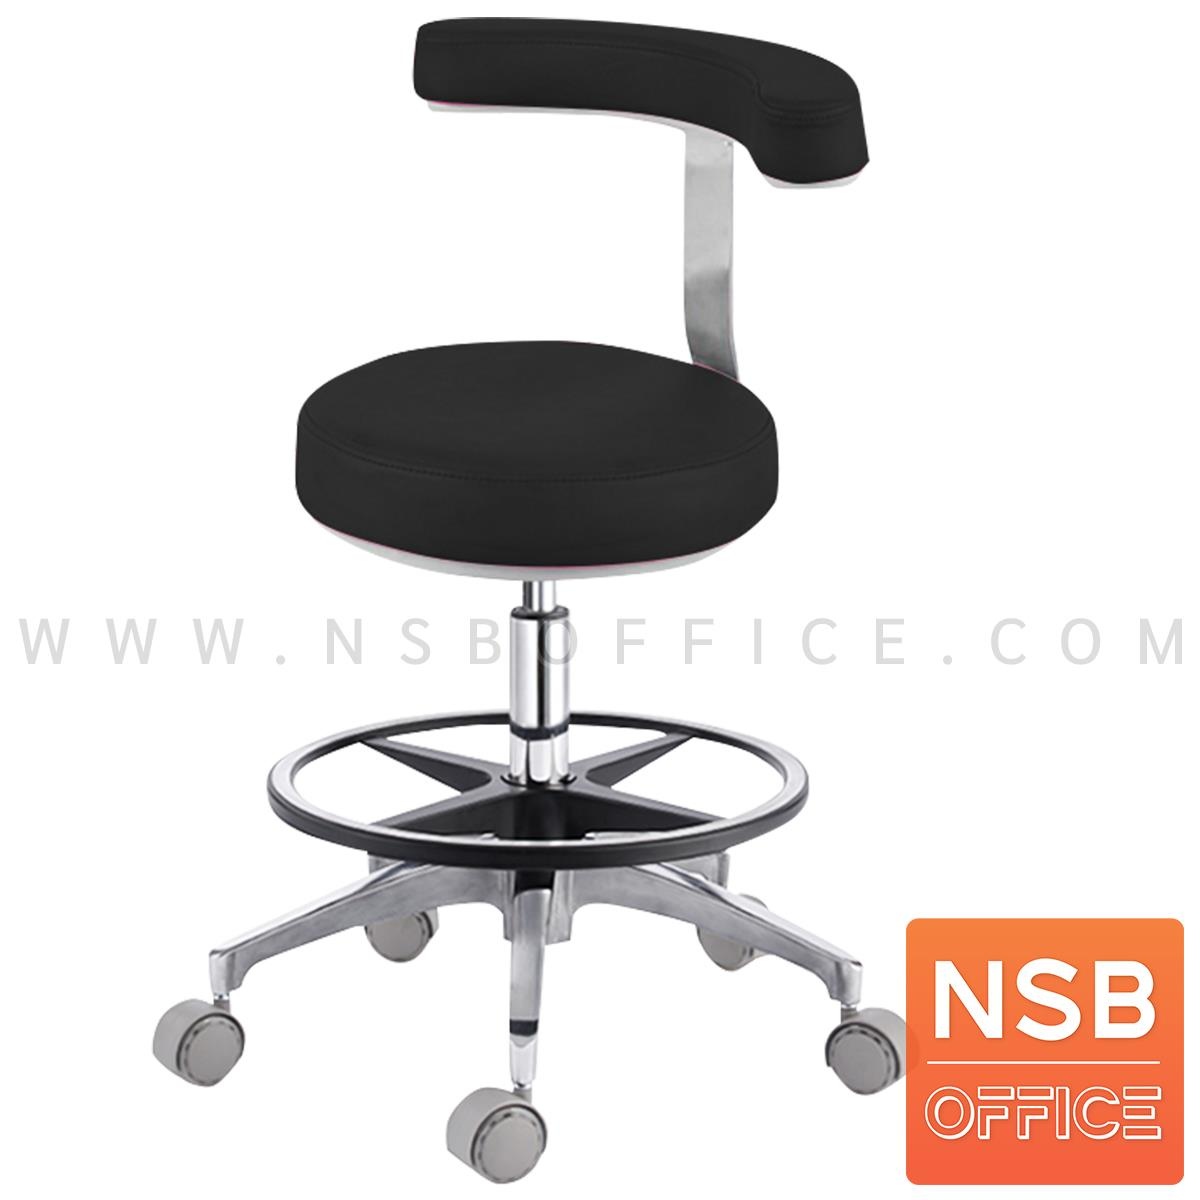 B09A207:เก้าอี้คุณหมอเบาะ PU foam พนักพิงหมุนได้รอบที่นั่ง รุ่น Imbruglia (อิมบรูเลีย)  ขาอลูมิเนียม ลูกล้อเก็บเสียง